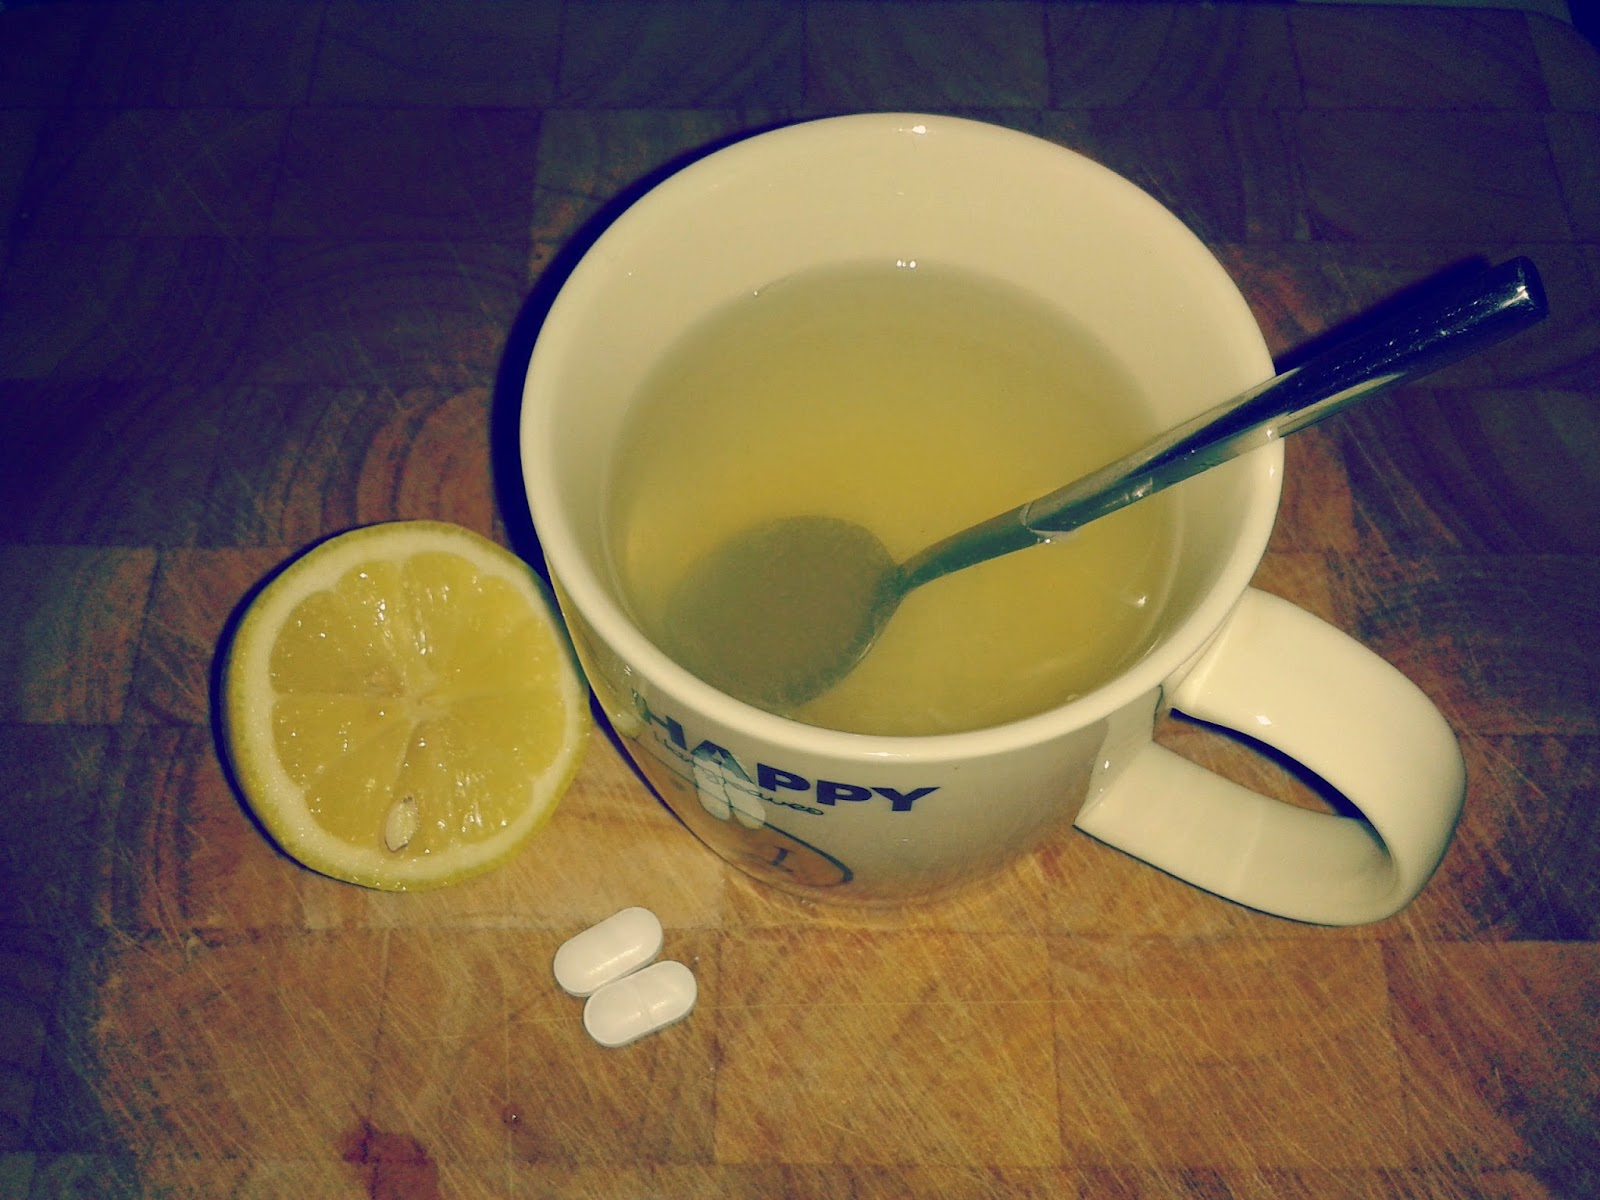 Project 365 day 357 - Hot Lemon & Honey // 76sunflowers